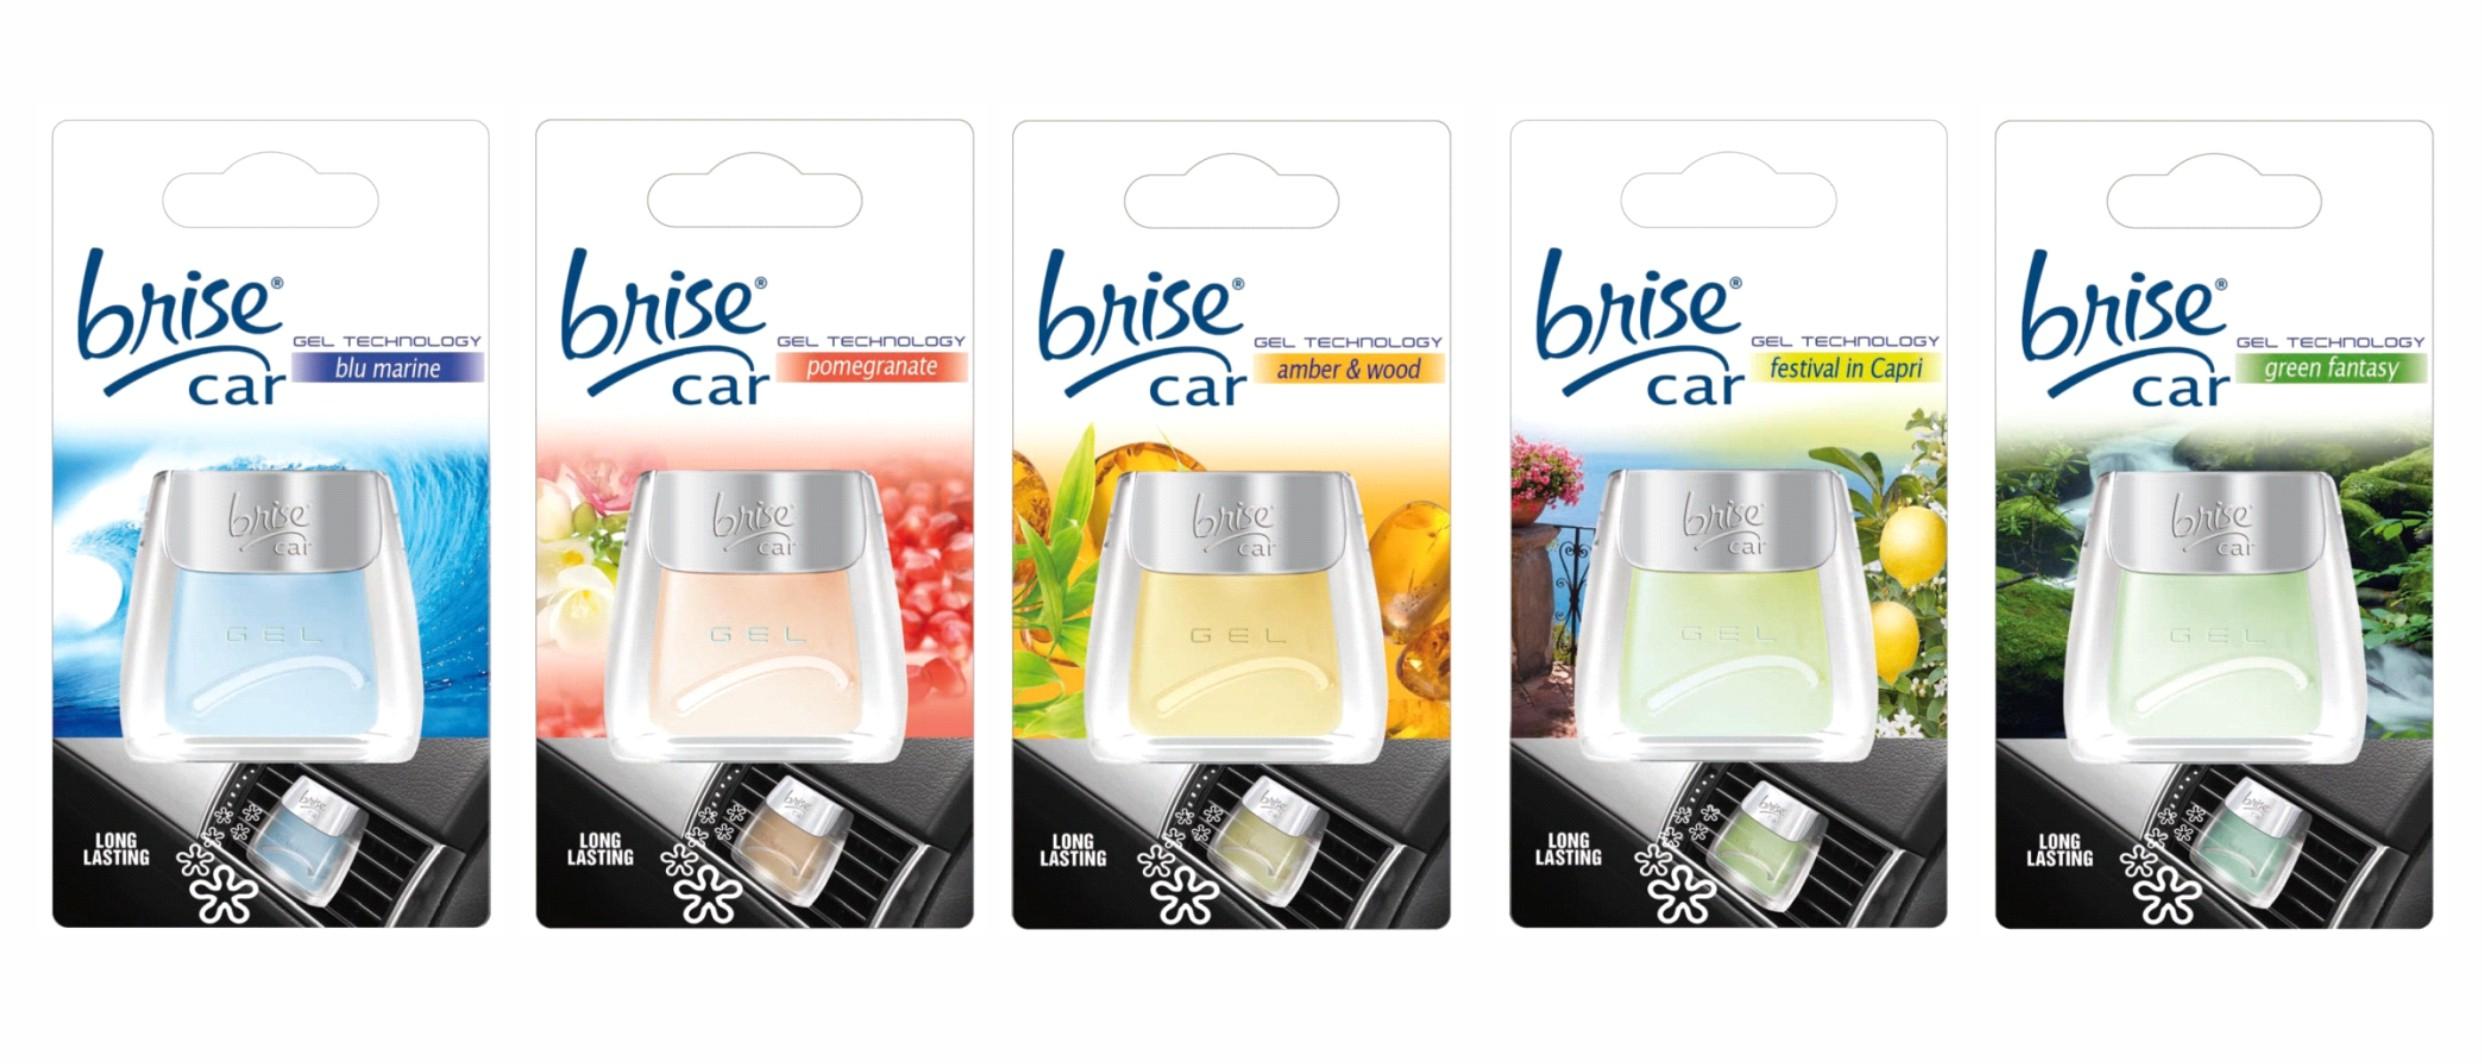 Airgel car air freshener Brise Car flavor: Festival in Capri  -  Brise by Glade – Bild 4